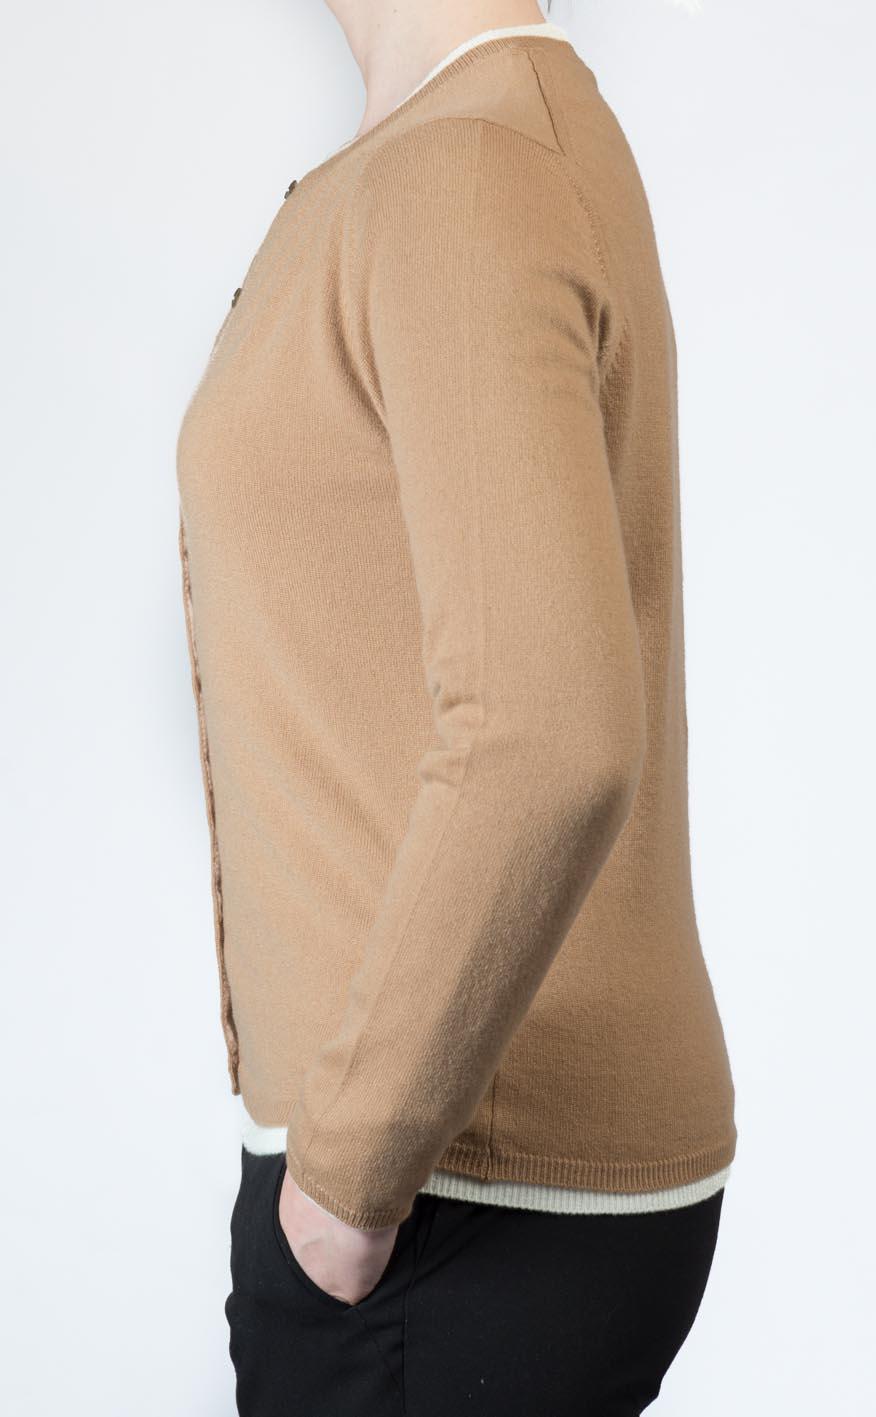 Ladies Cashmere Cardigan by Scotweb 0b38399d7